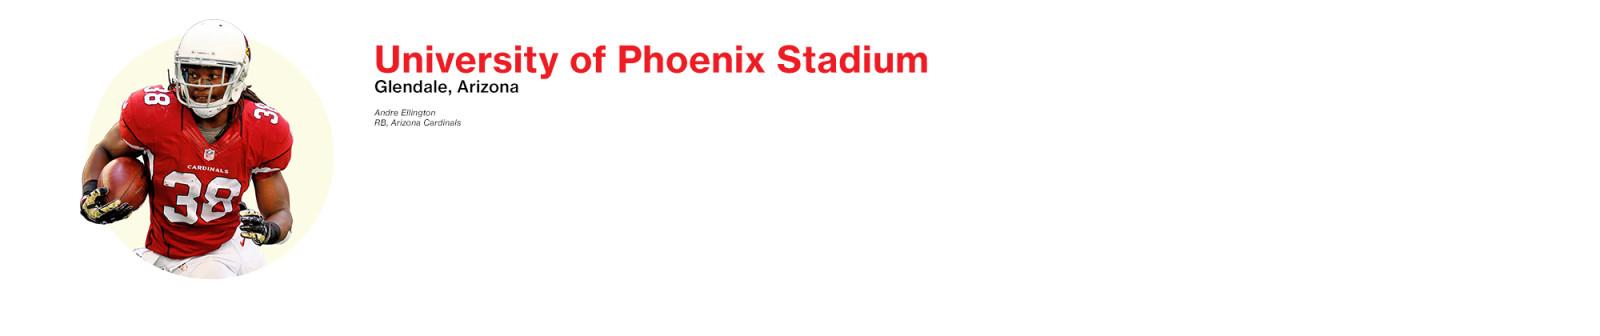 NFL_header_Arizona